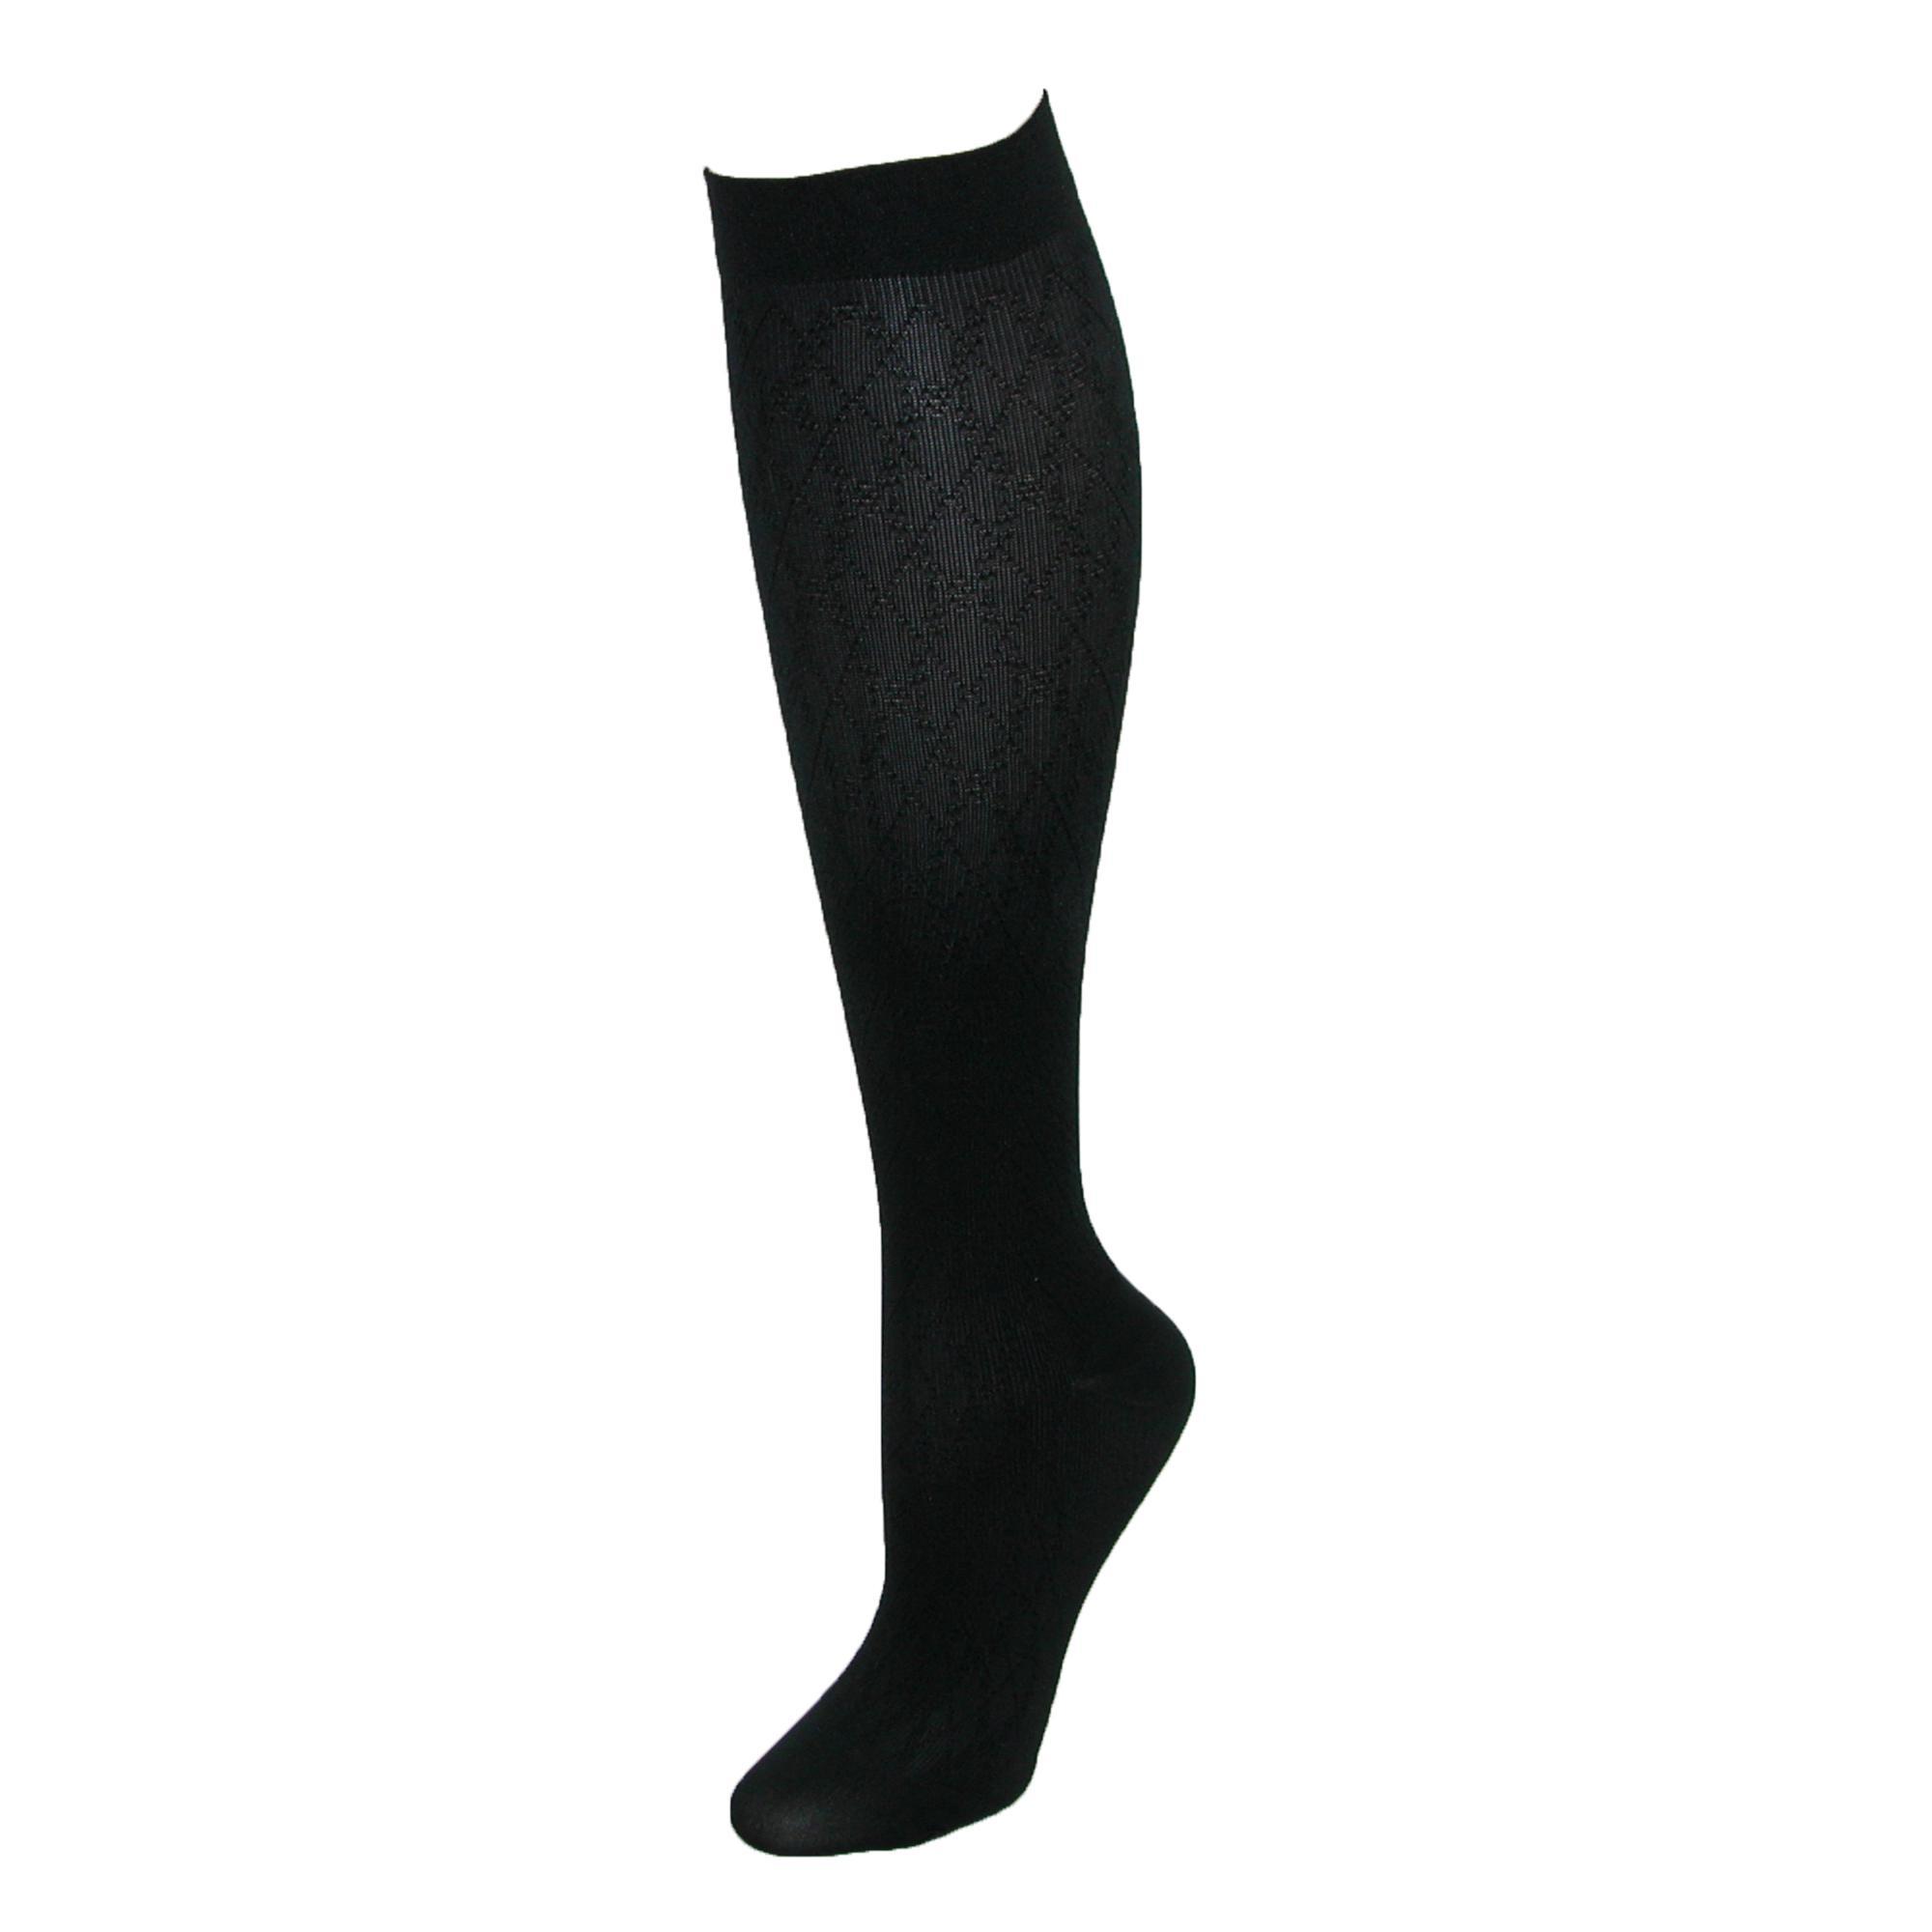 Jefferies Socks Womens Compression Dress Sock With Diamond Pattern